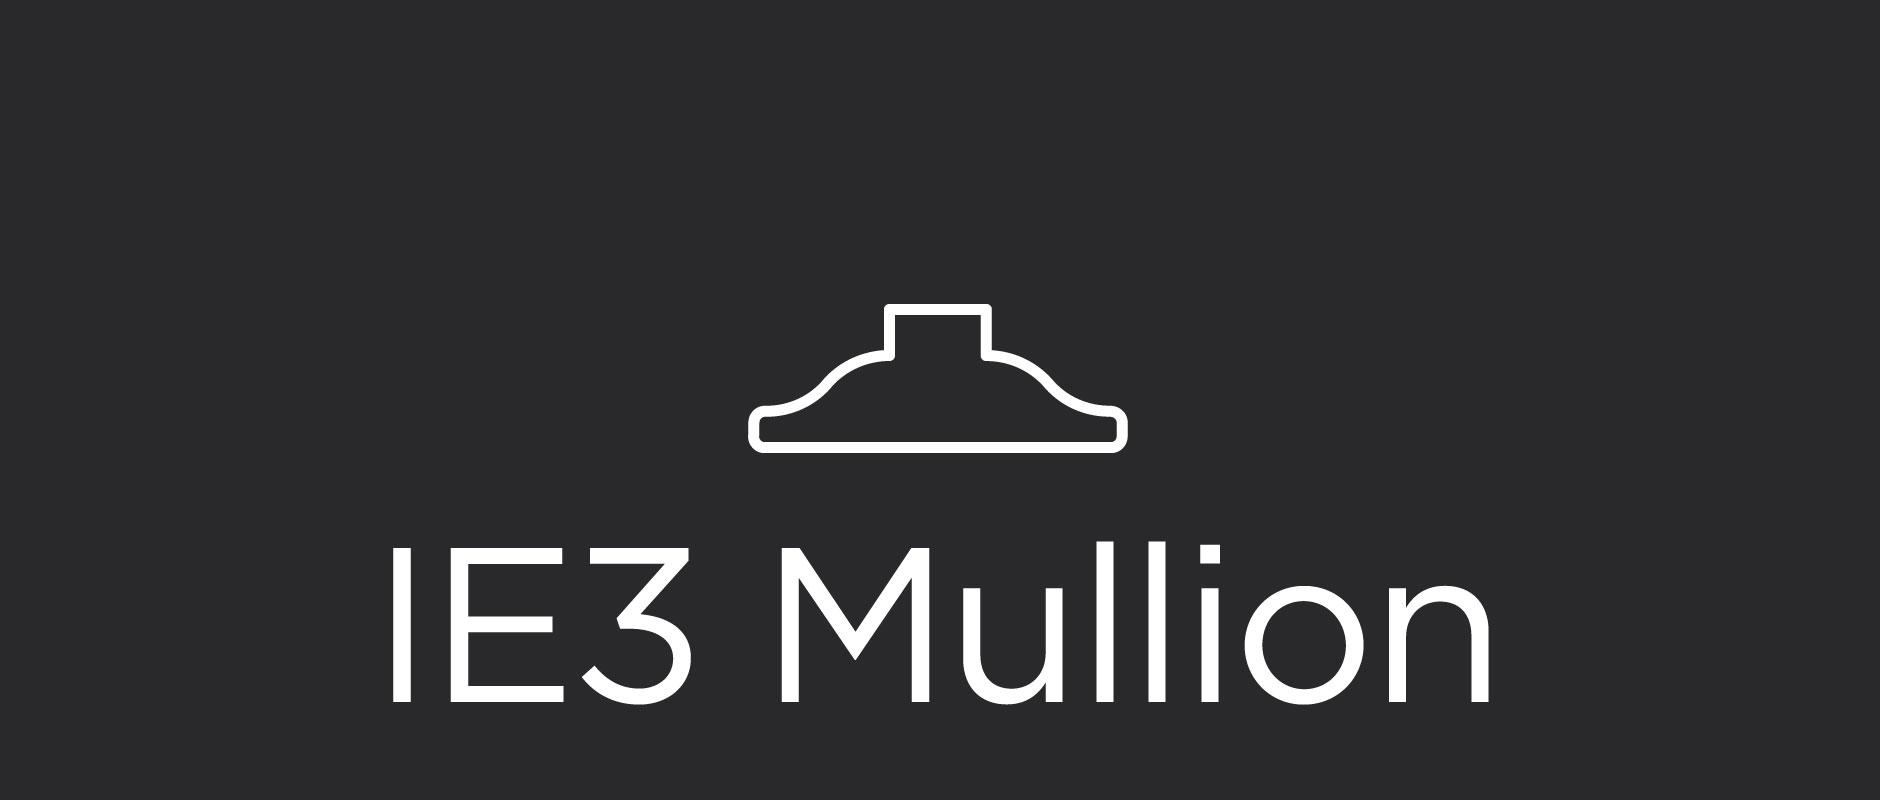 IE3 mullion for divided lite cabinet doors